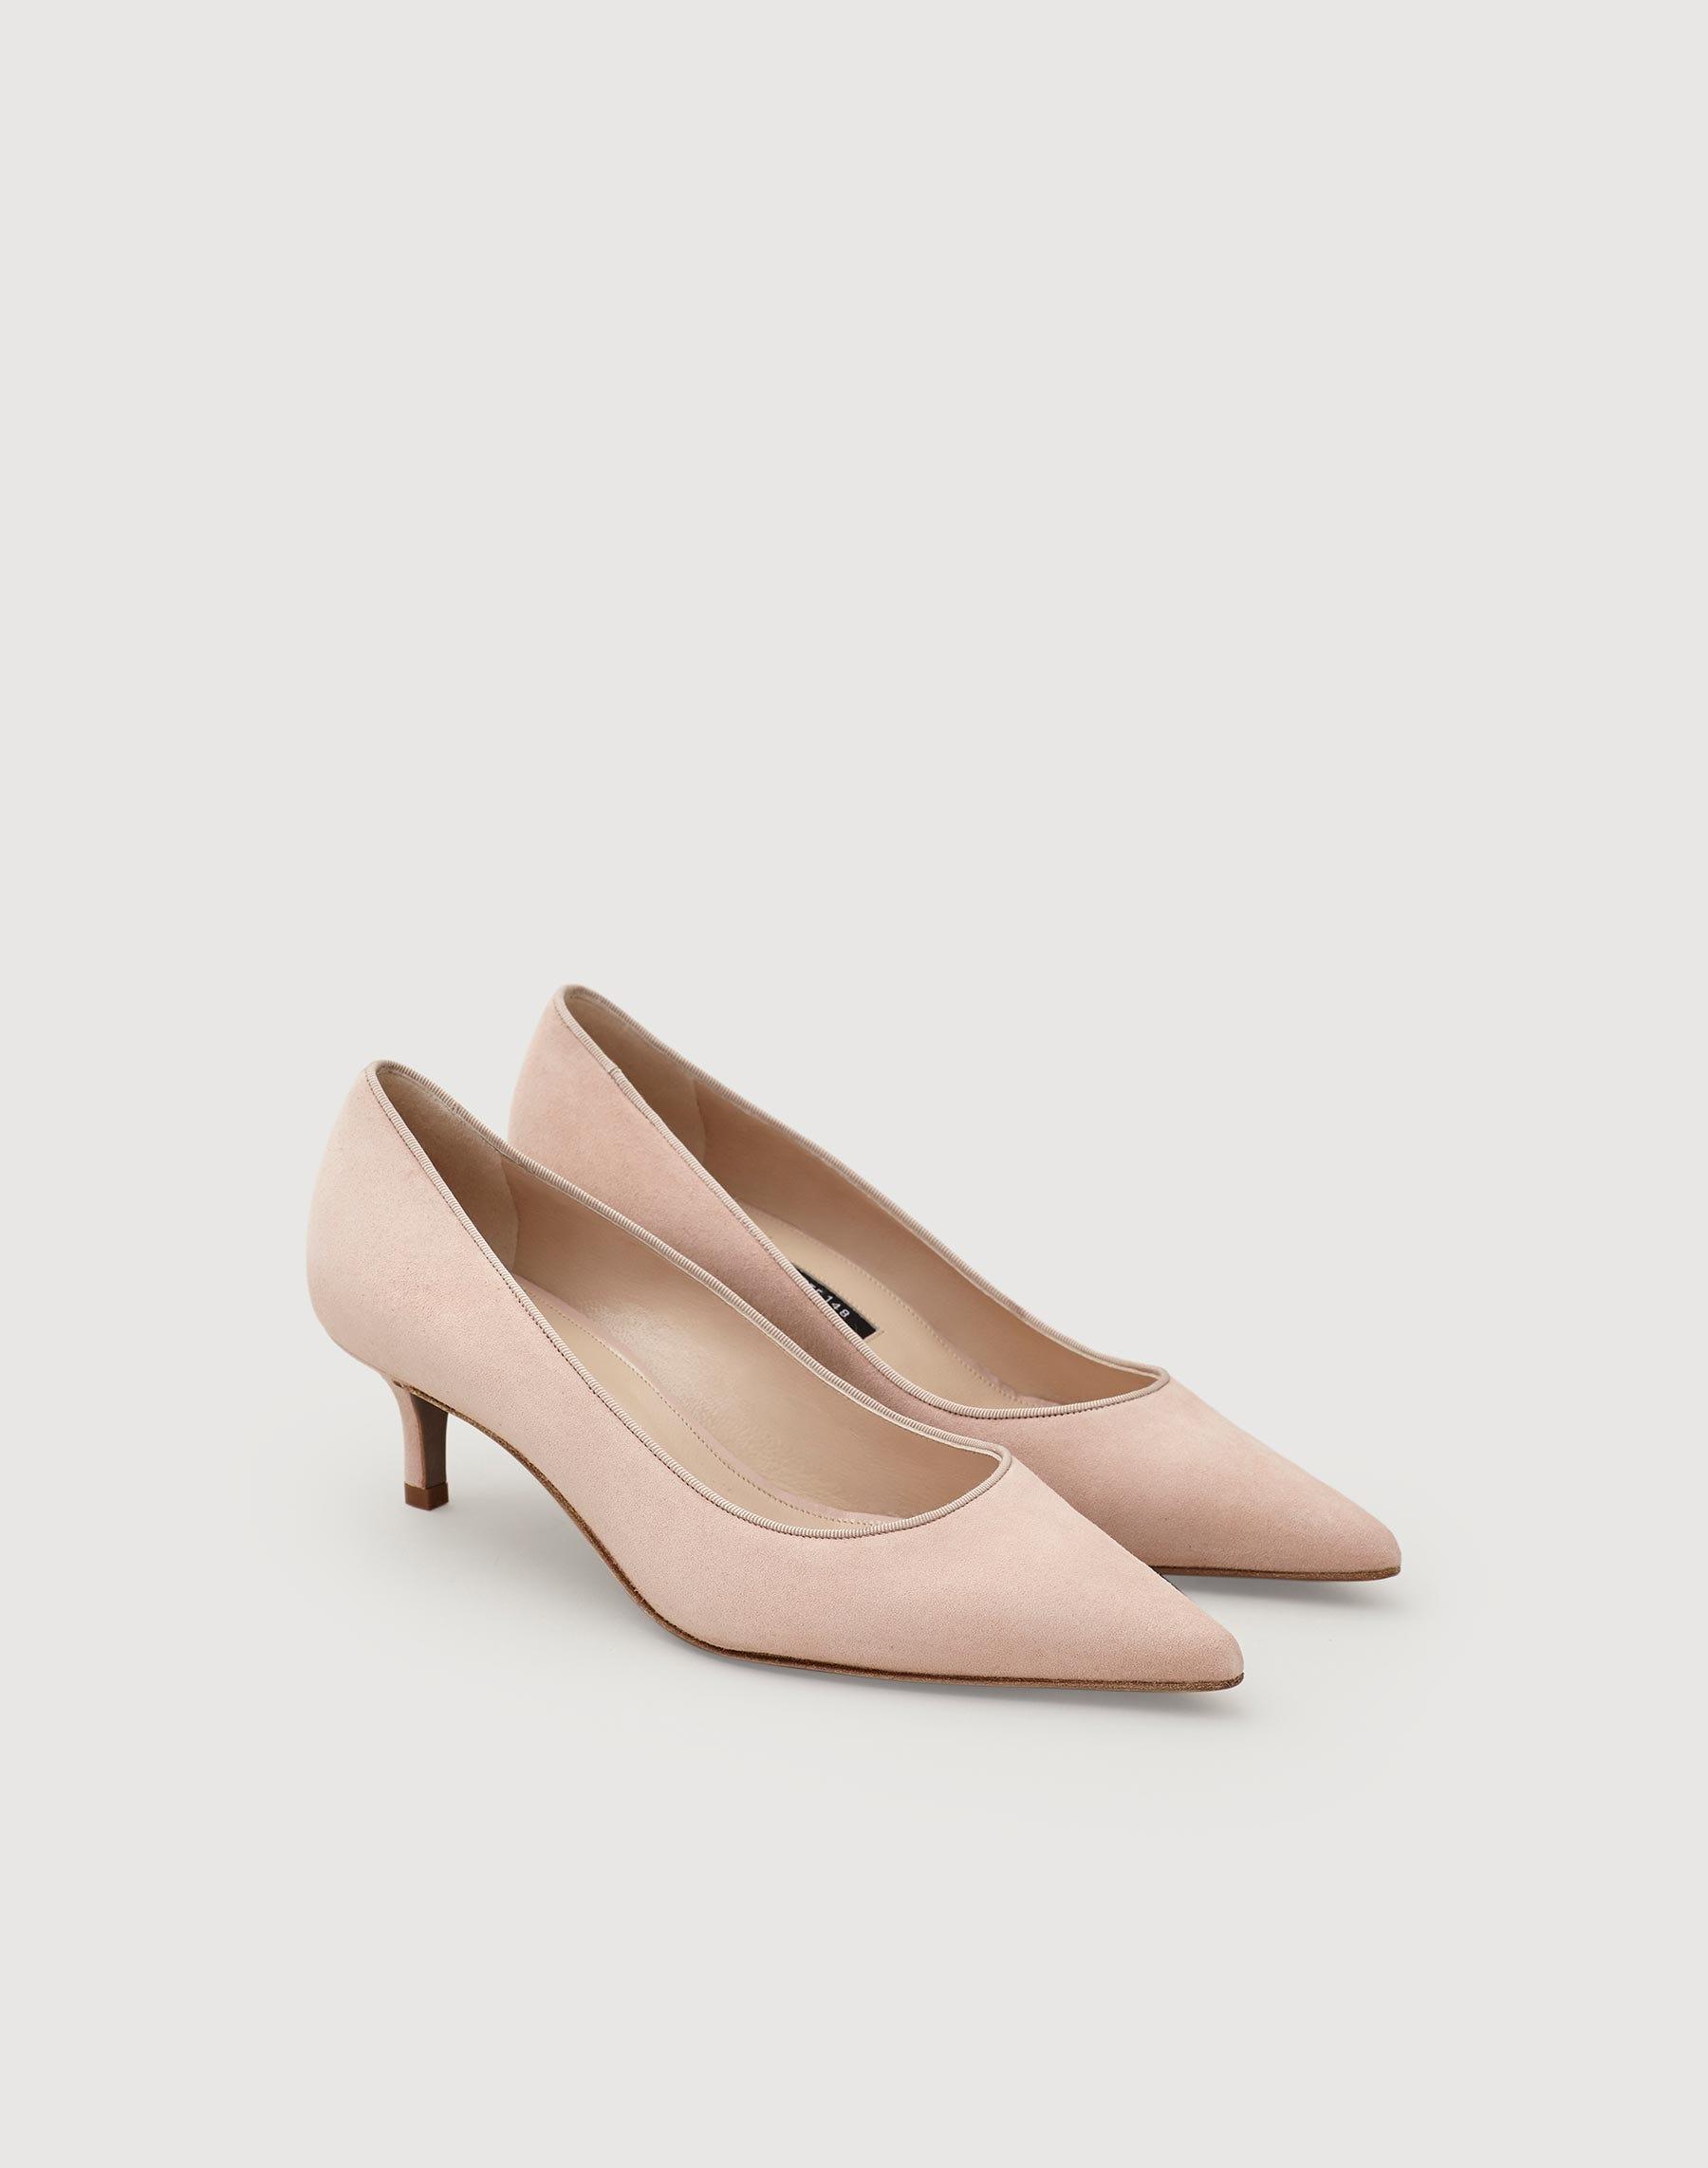 a4e778b2676 Libbet kitten heel lafayette new york jpg 1800x2285 Kitten heels